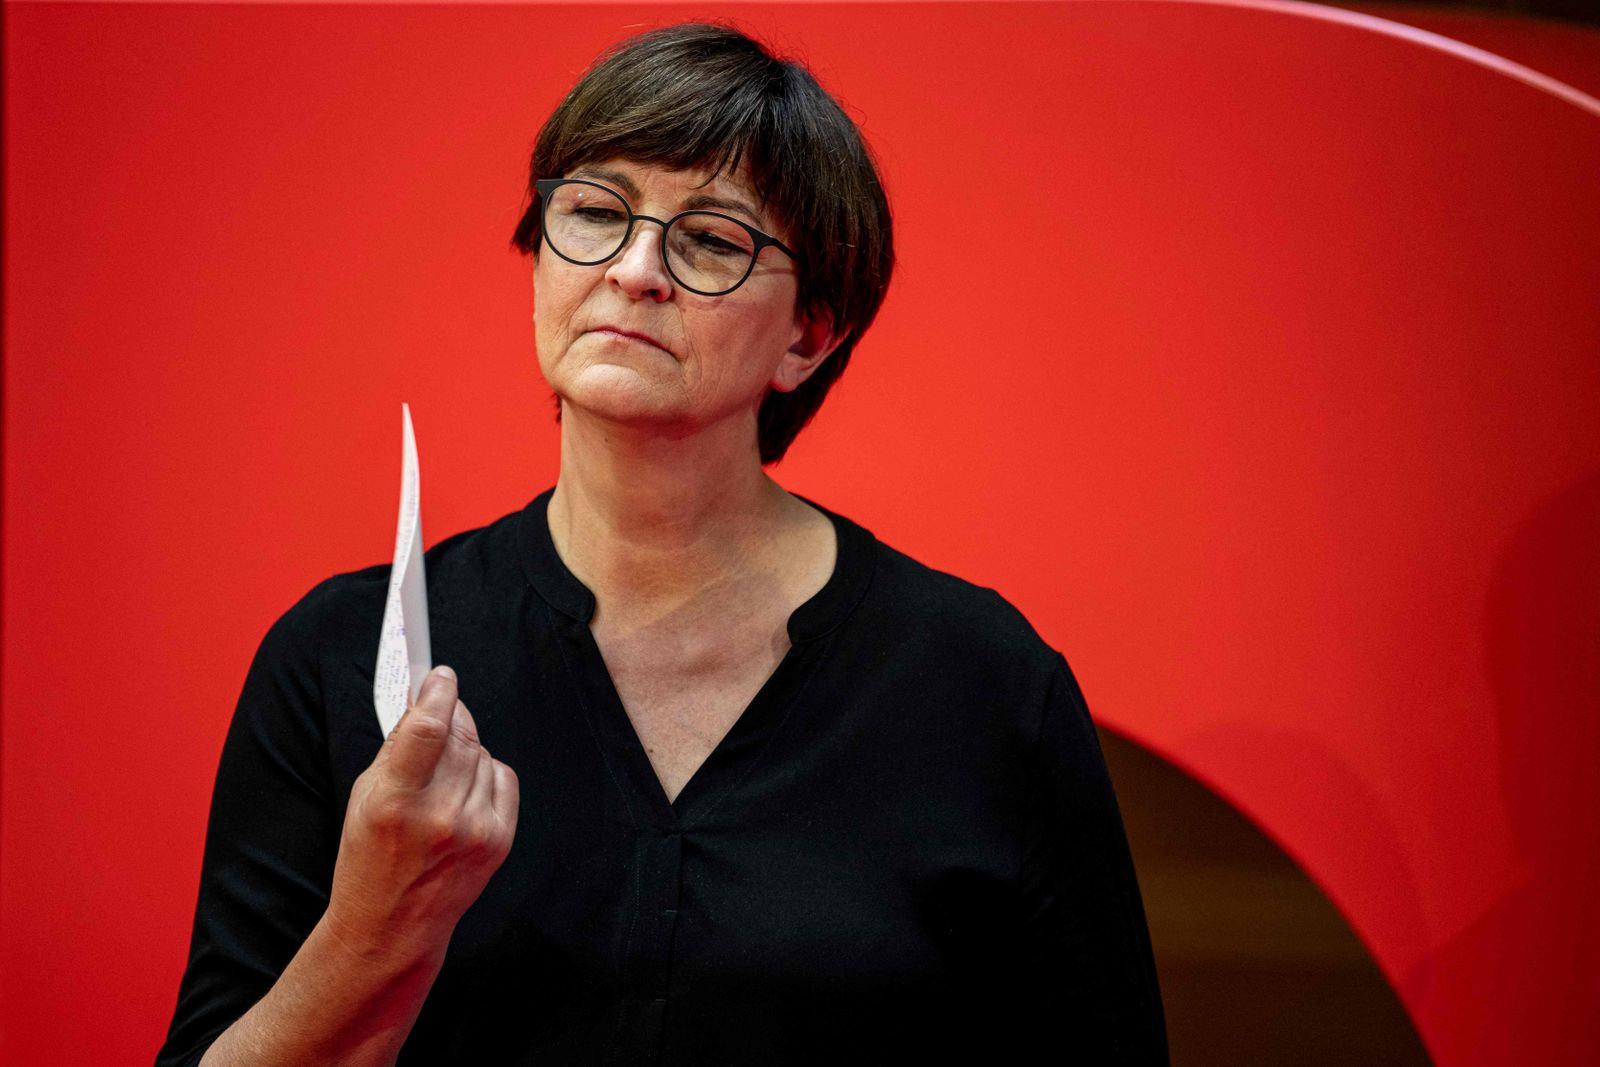 GERMANY-POLITICS-ELECTION-PARTIES-SPD